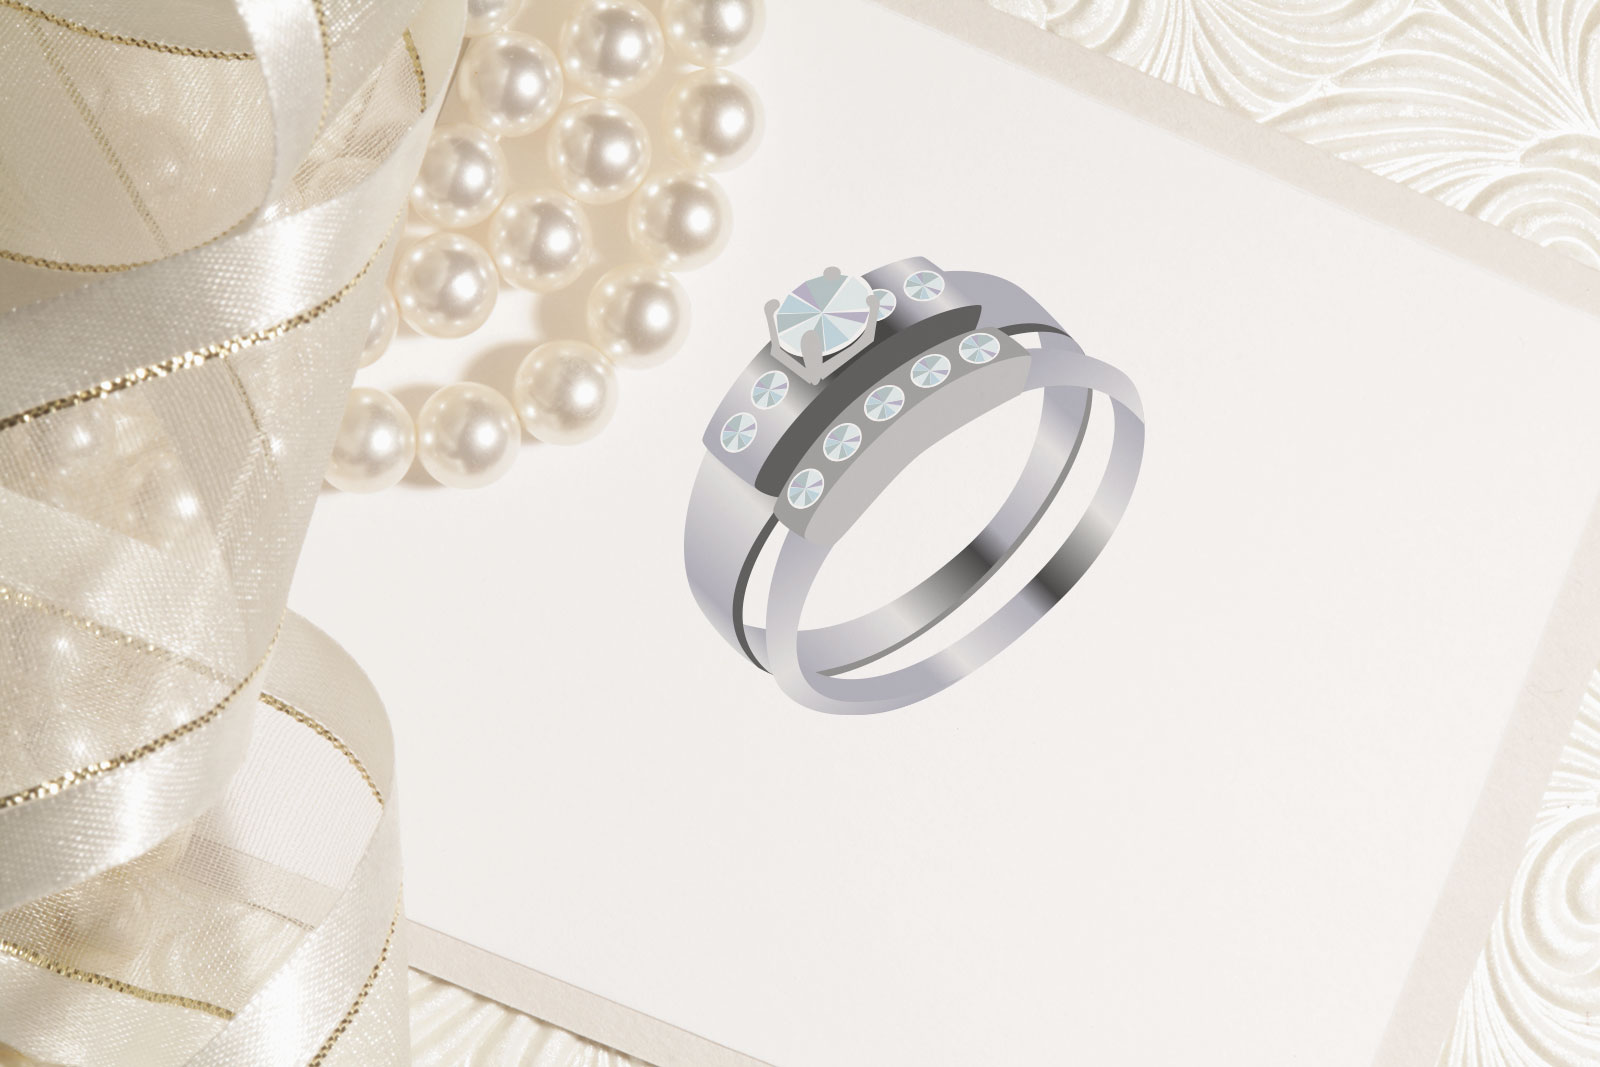 Wedding Ring Clipart Lovetoknow